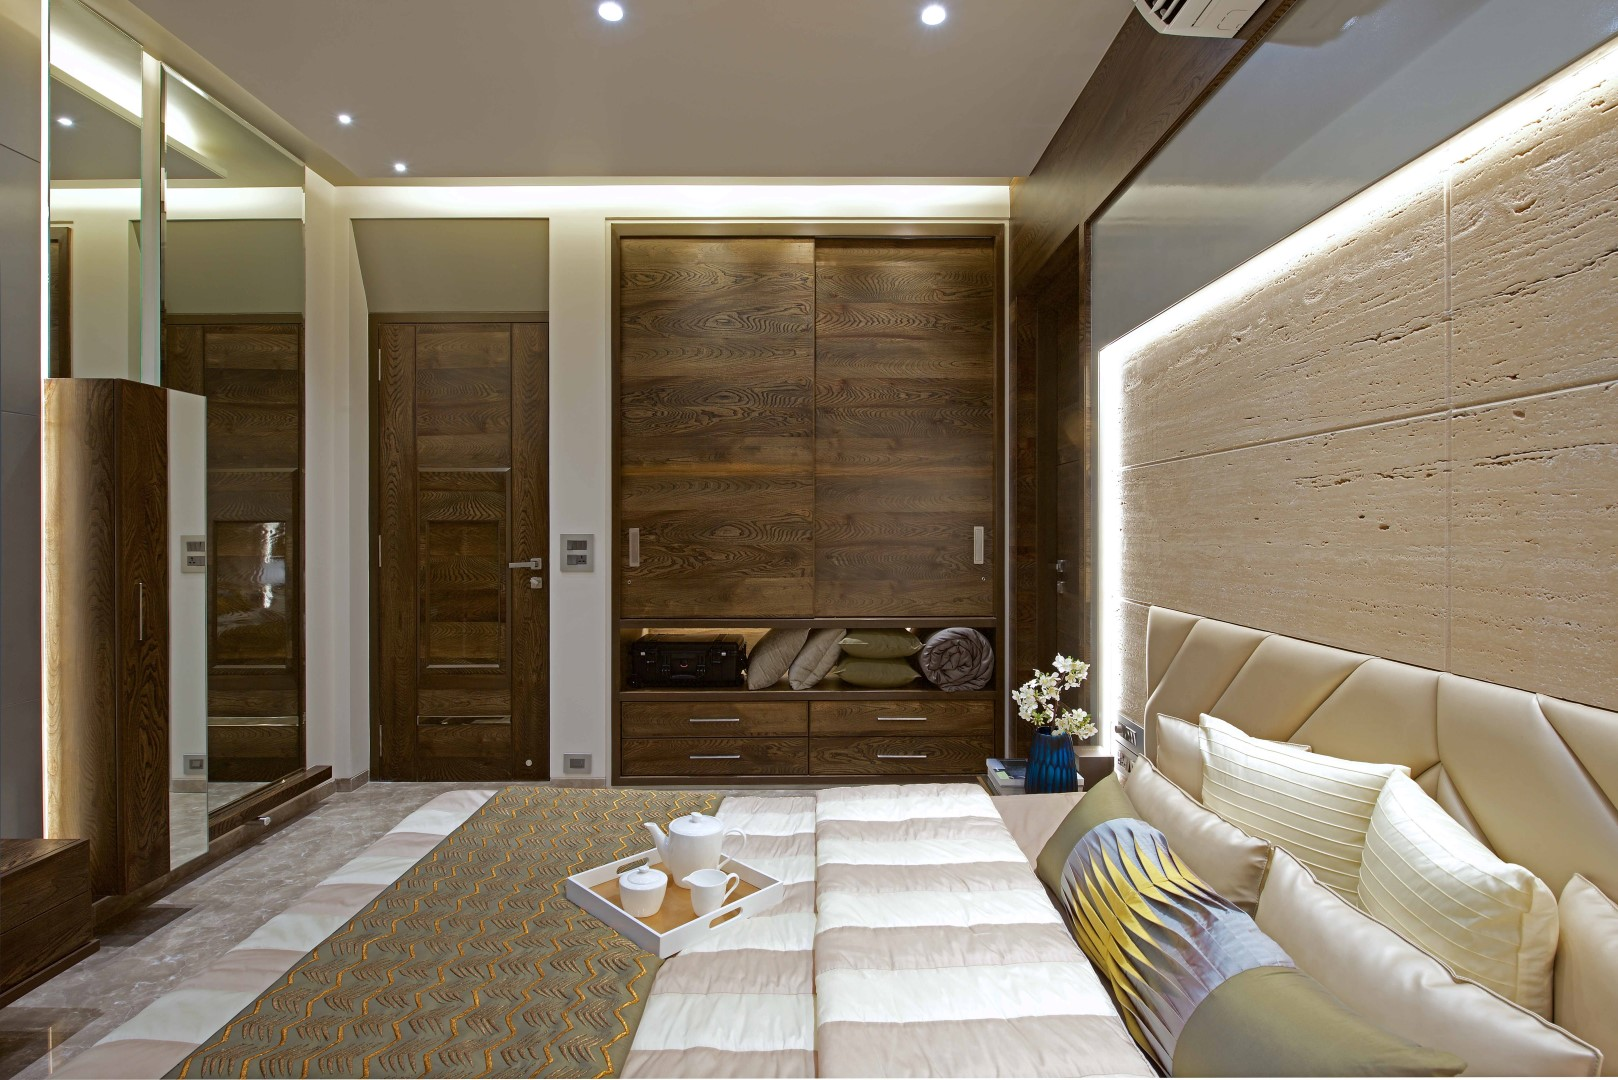 3 Bhk Apartment Interiors At Yari Road Amit Shastri Architects The Architects Diary